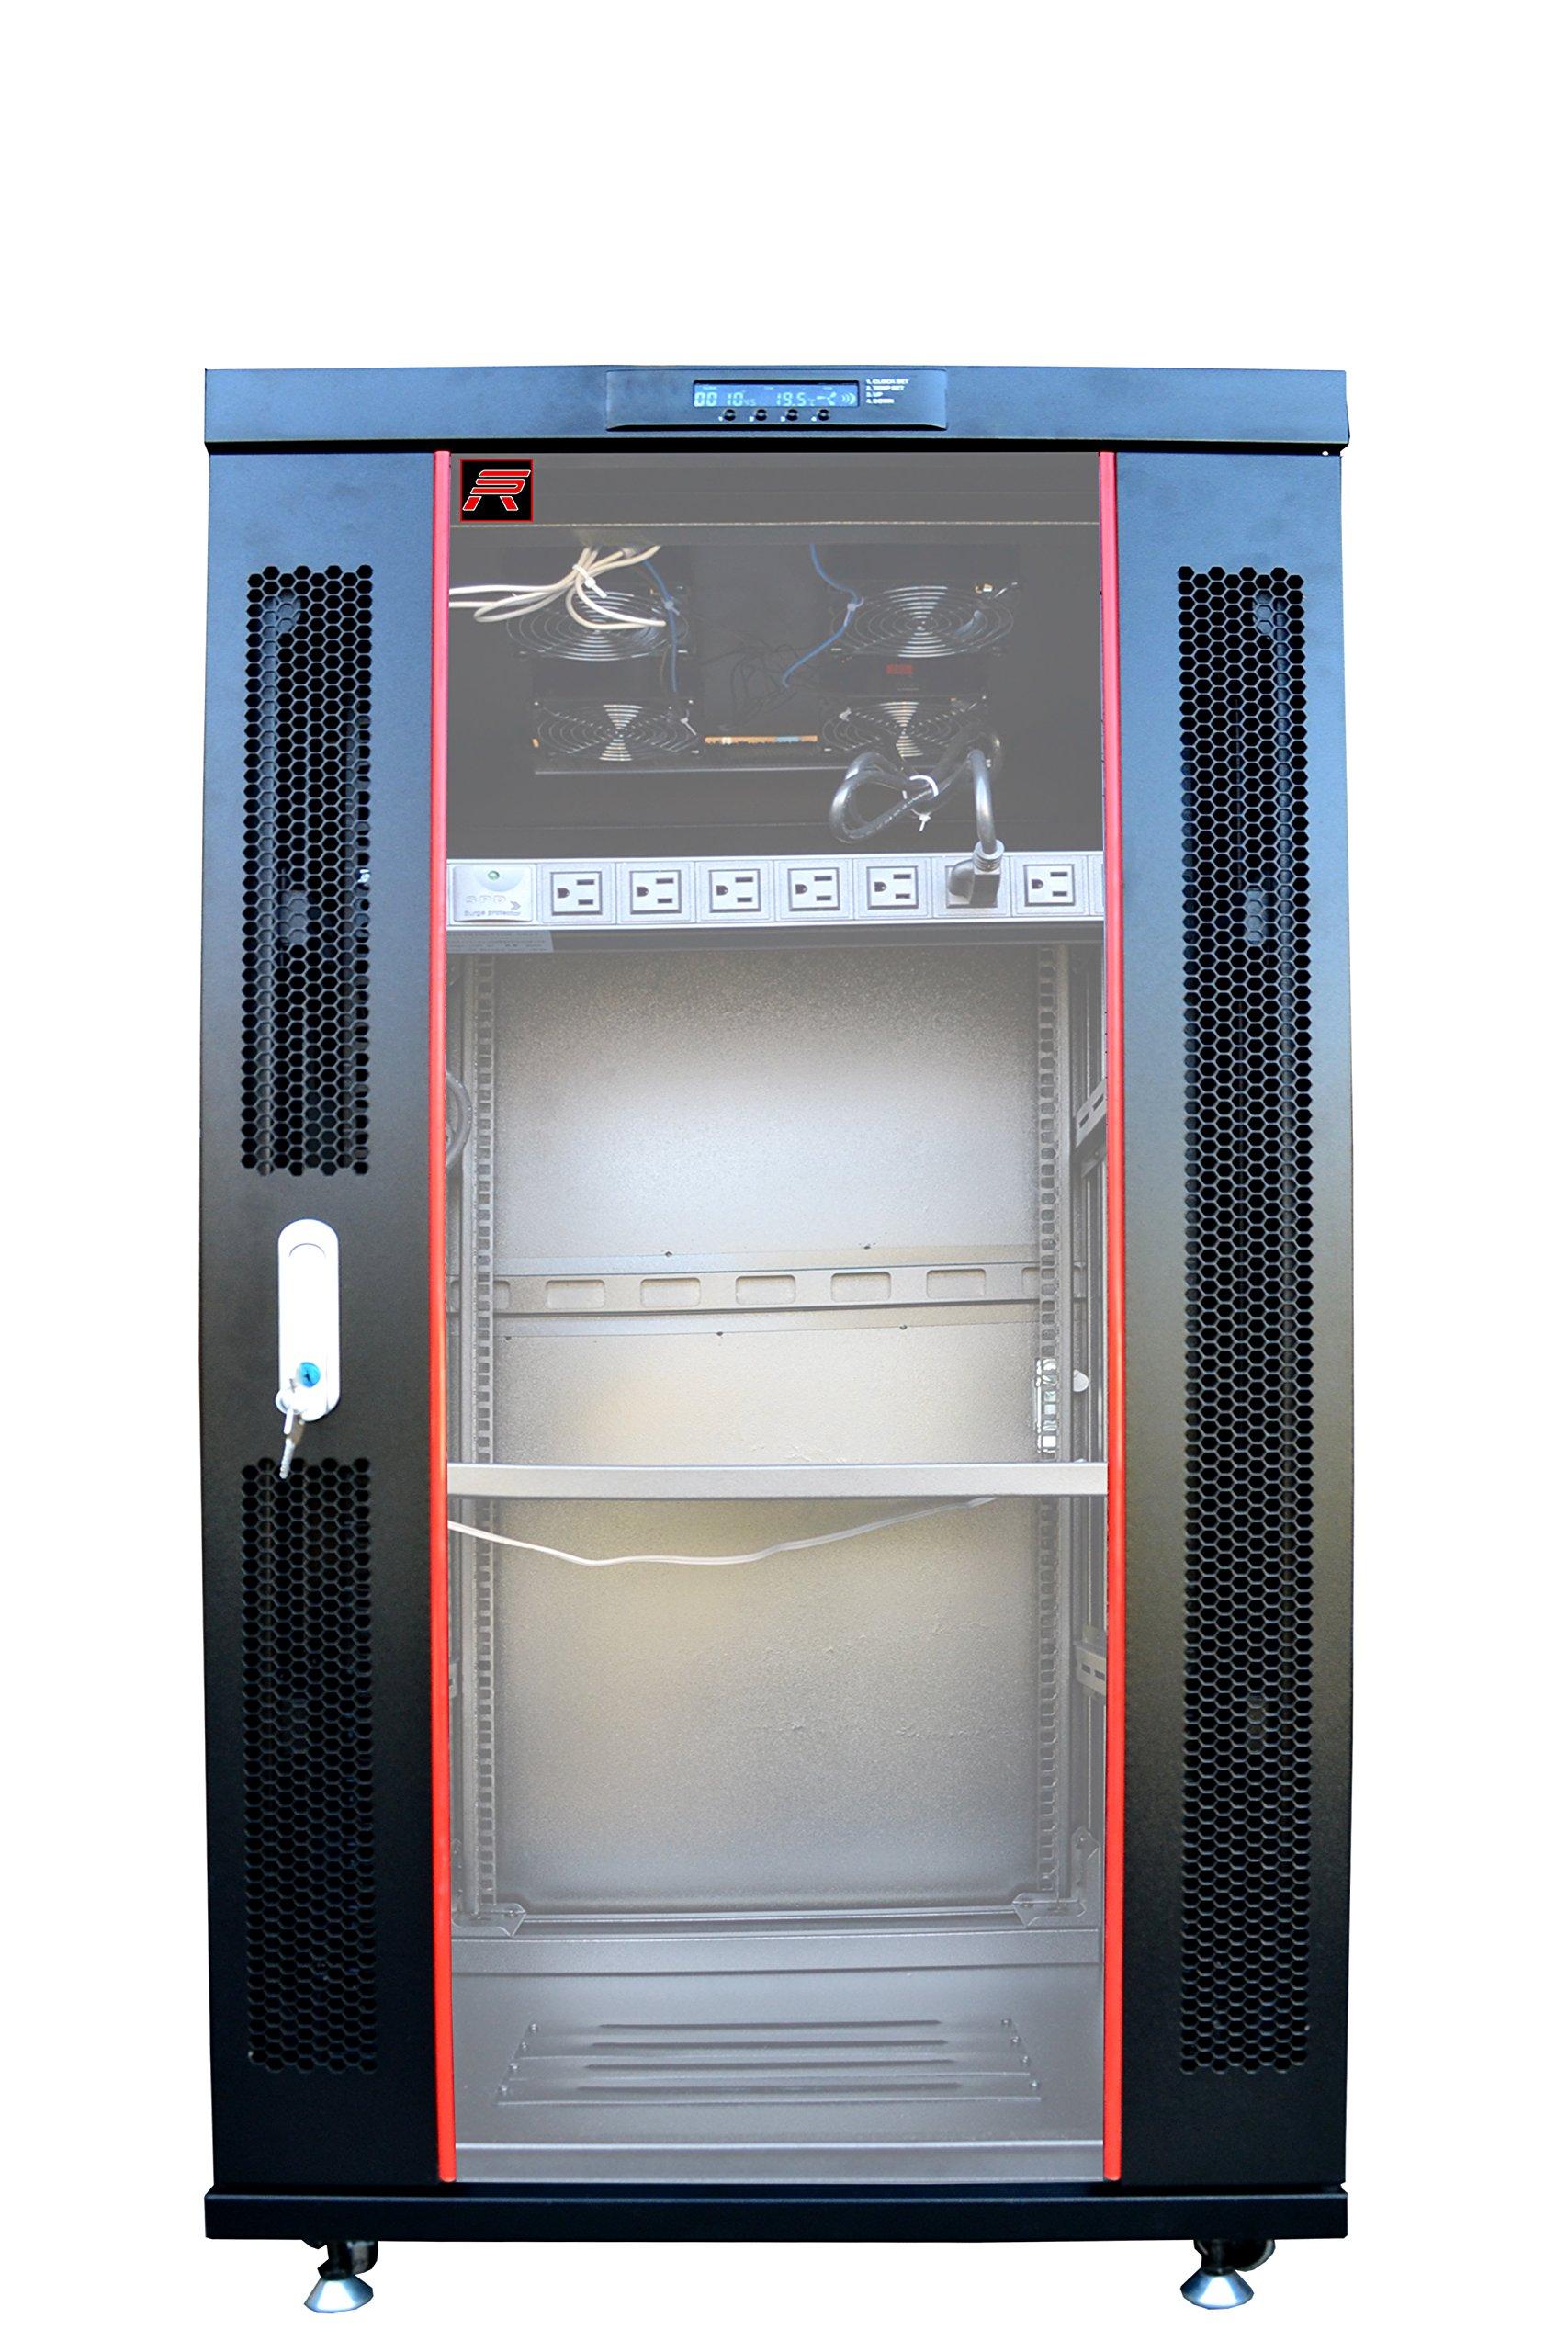 Sysracks 18U 35'' Deep Server IT Telecommunication Network Data Rack Cabinet Enclosure. Fully Lockable, Accessories Included (Over $ 150 Value). LED Info Screen, Renew Ventilation System Design